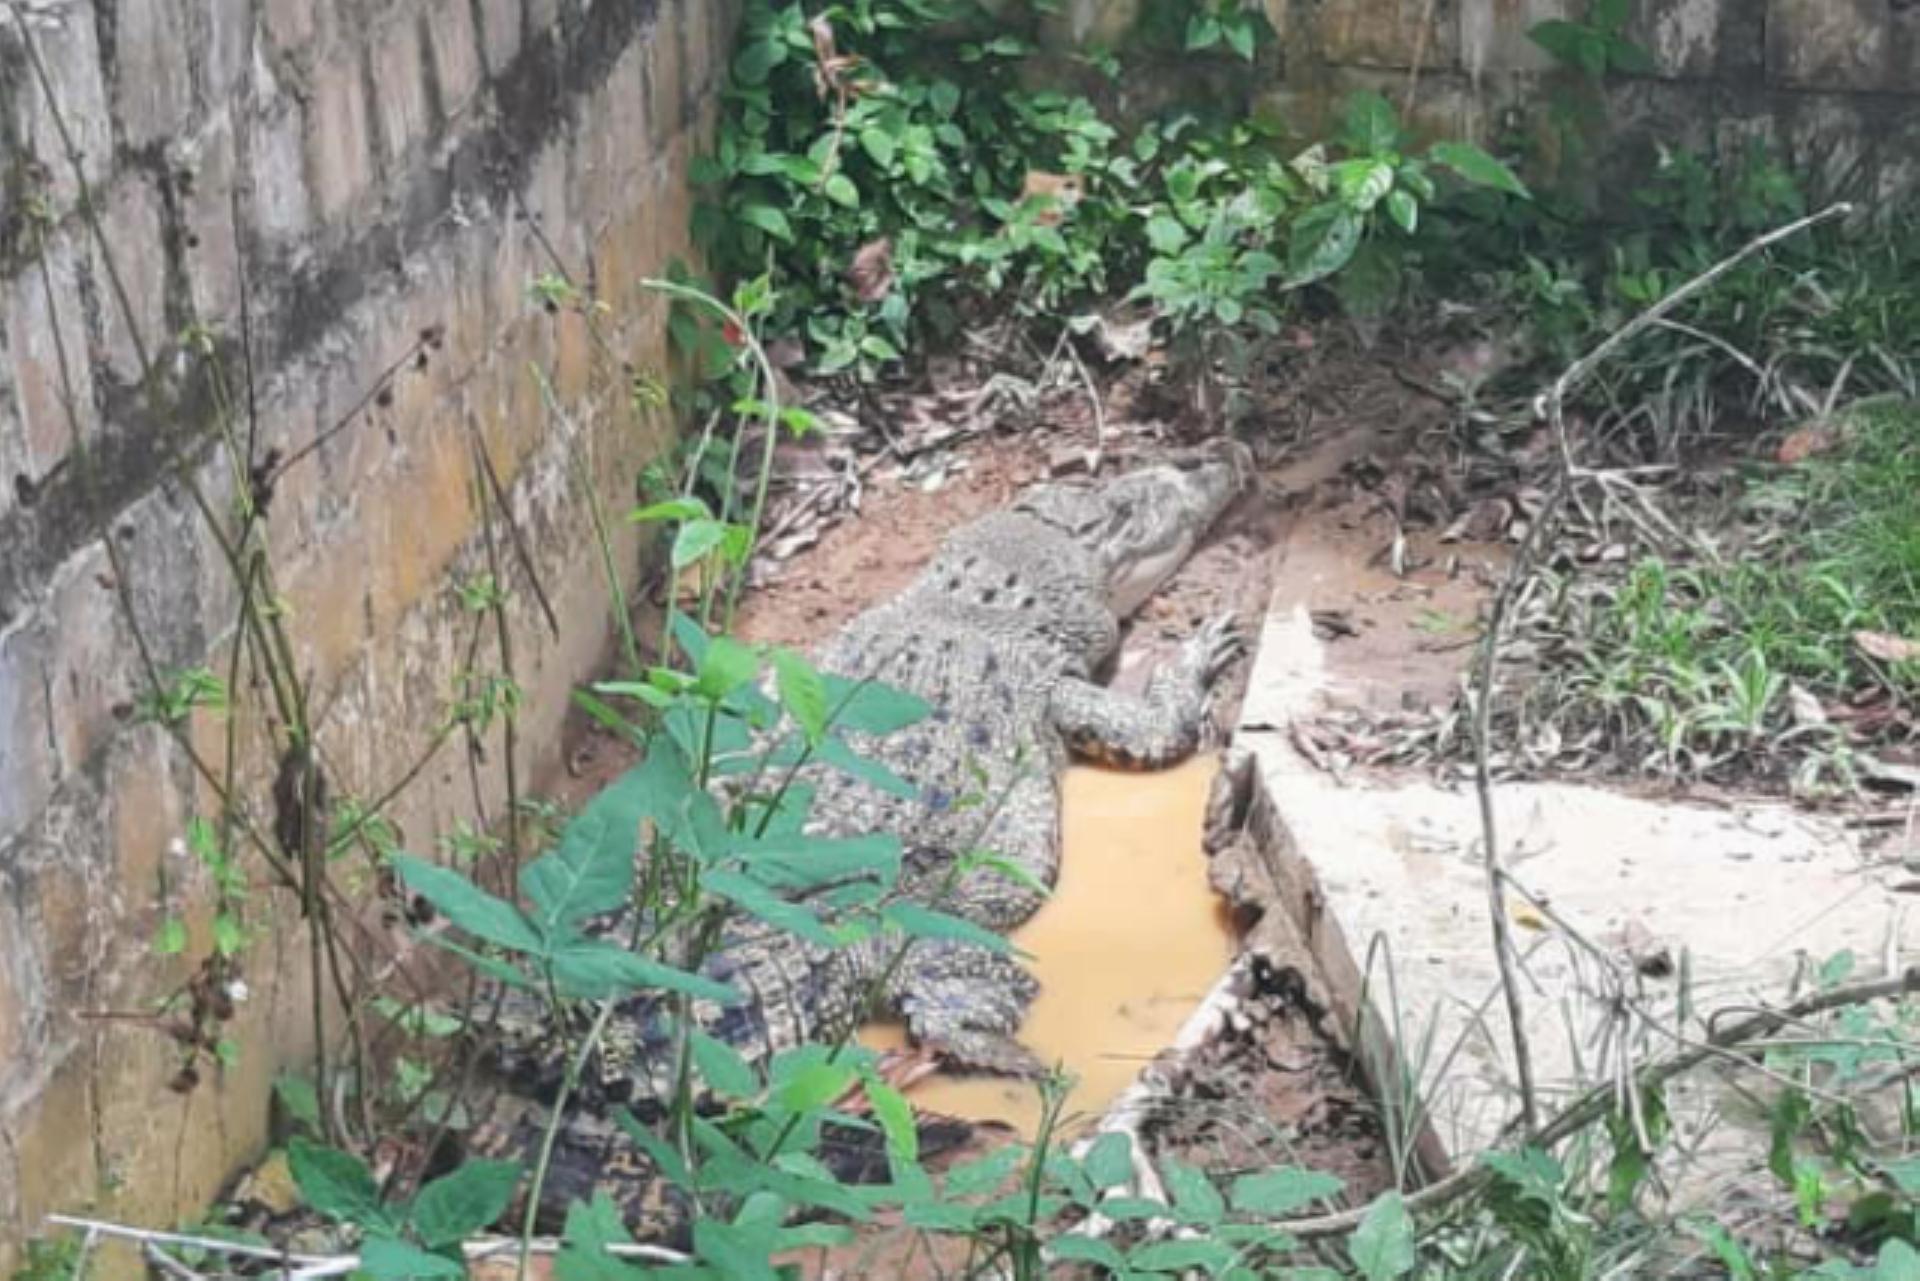 Illegal wildlife farm near Sibu raided, over two dozen endangered animals rescued